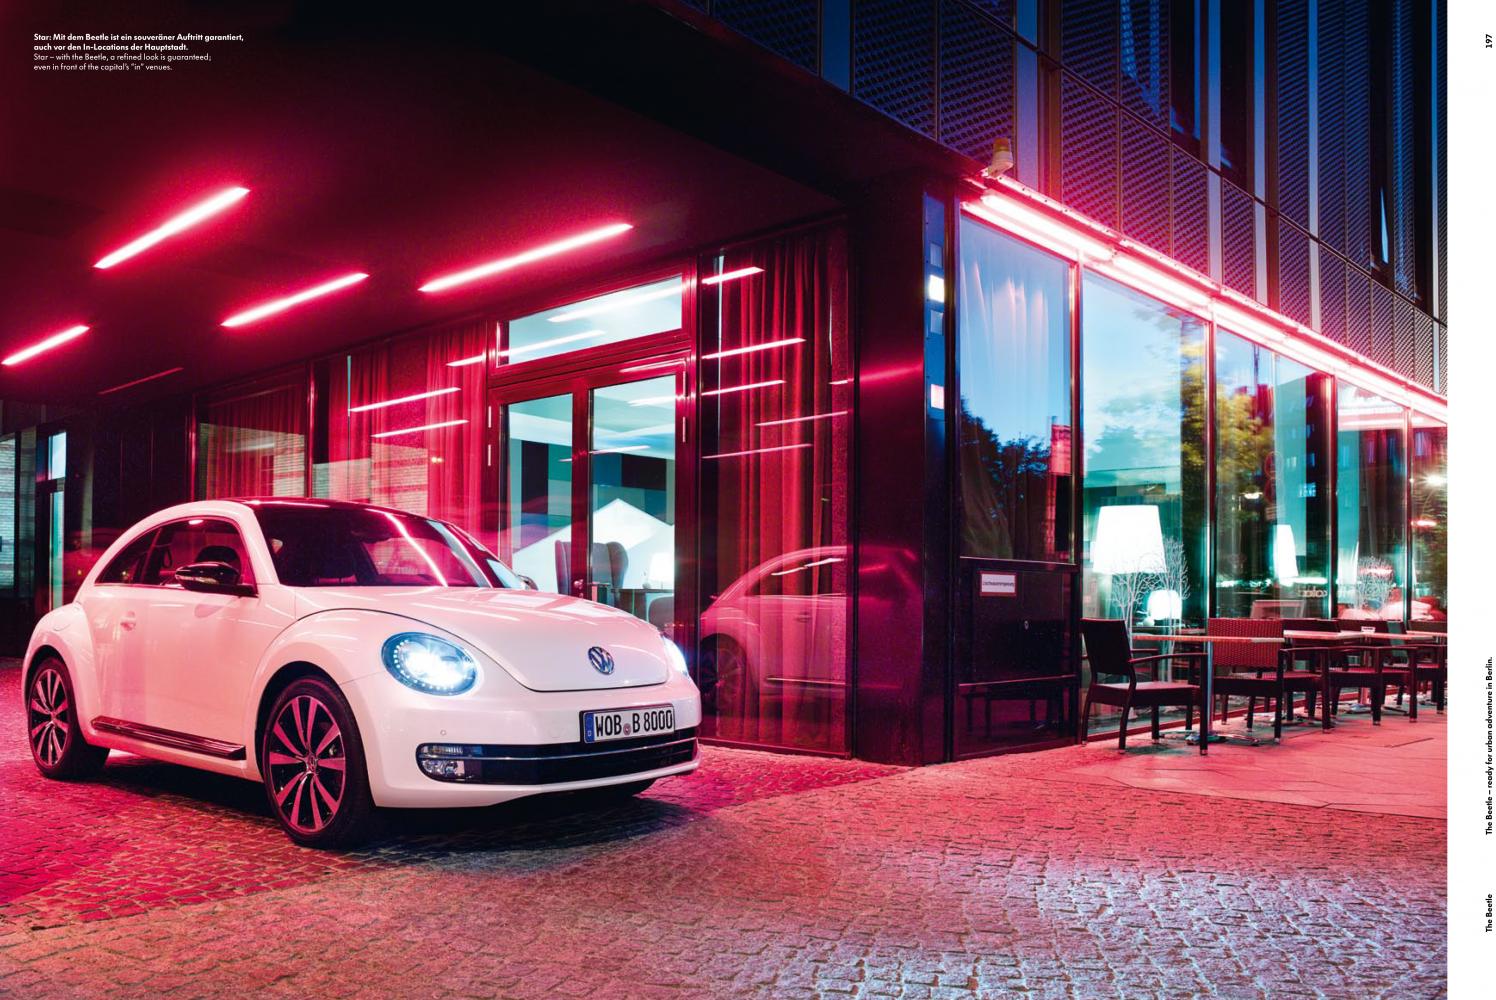 Rene_Staud_VW_Beetle_6